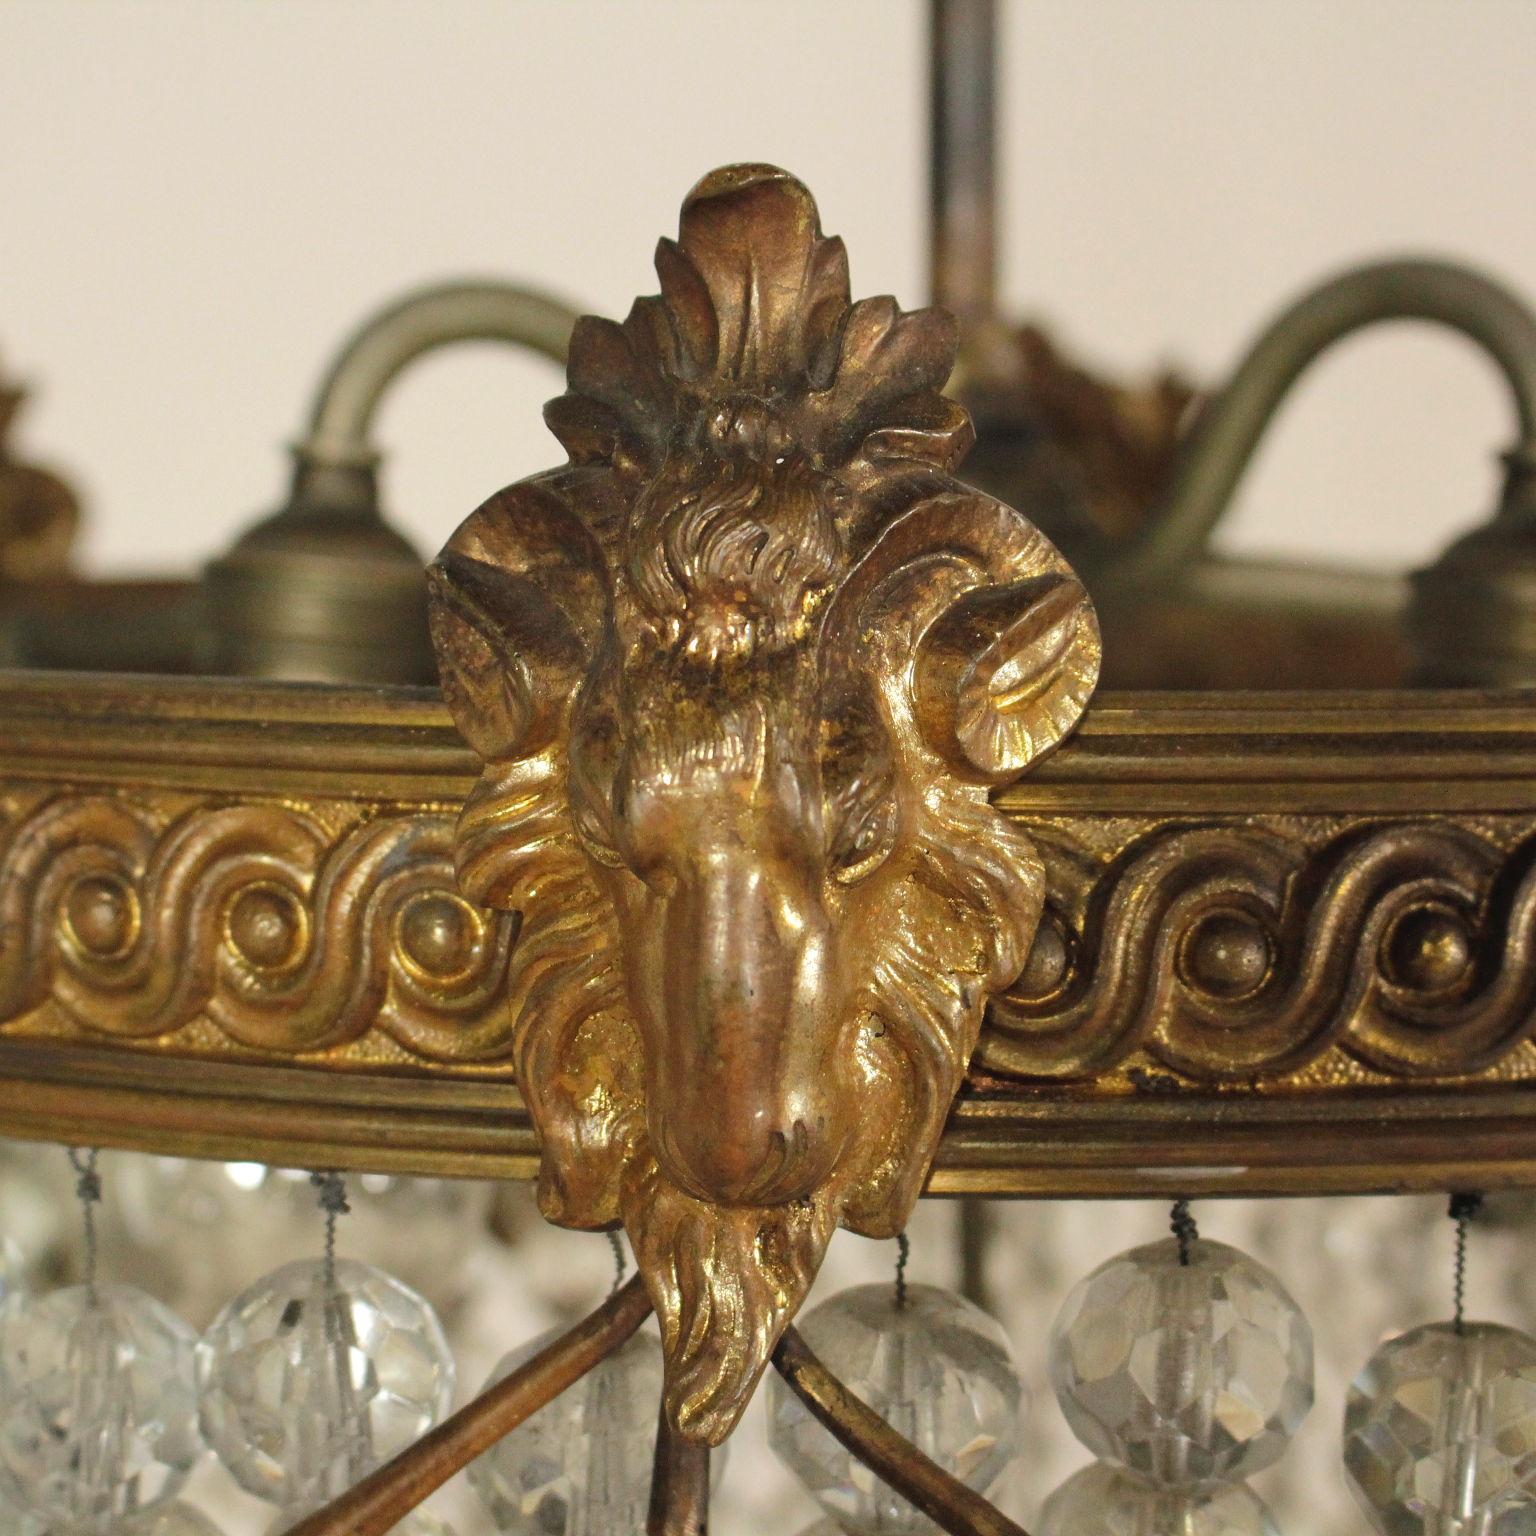 Antike Originale Vor 1945 Symbol Der Marke Empire Stil Chandelabra Kerzenhalter